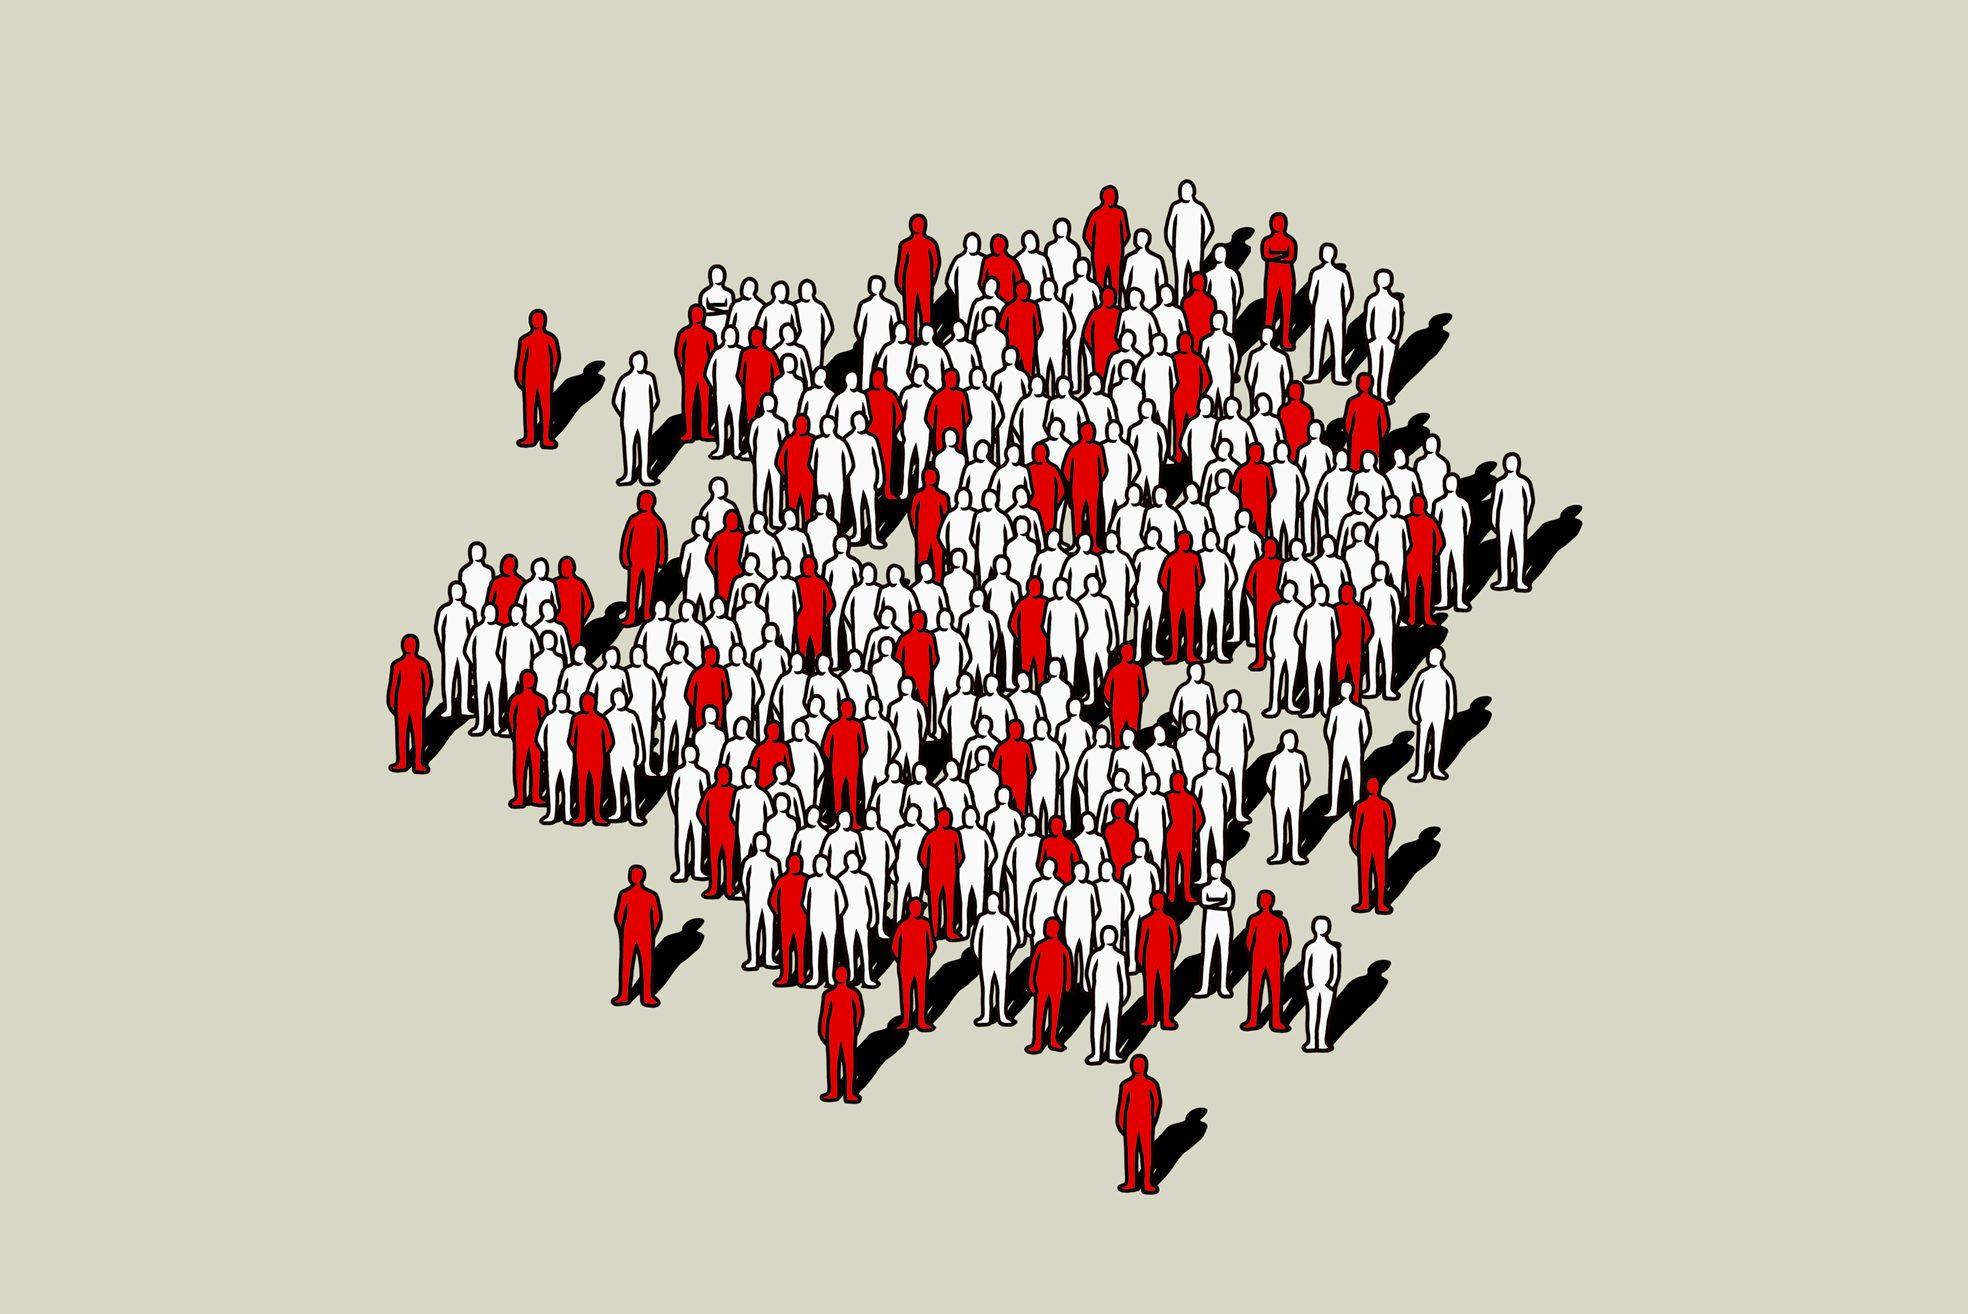 heart disease fatality illustration